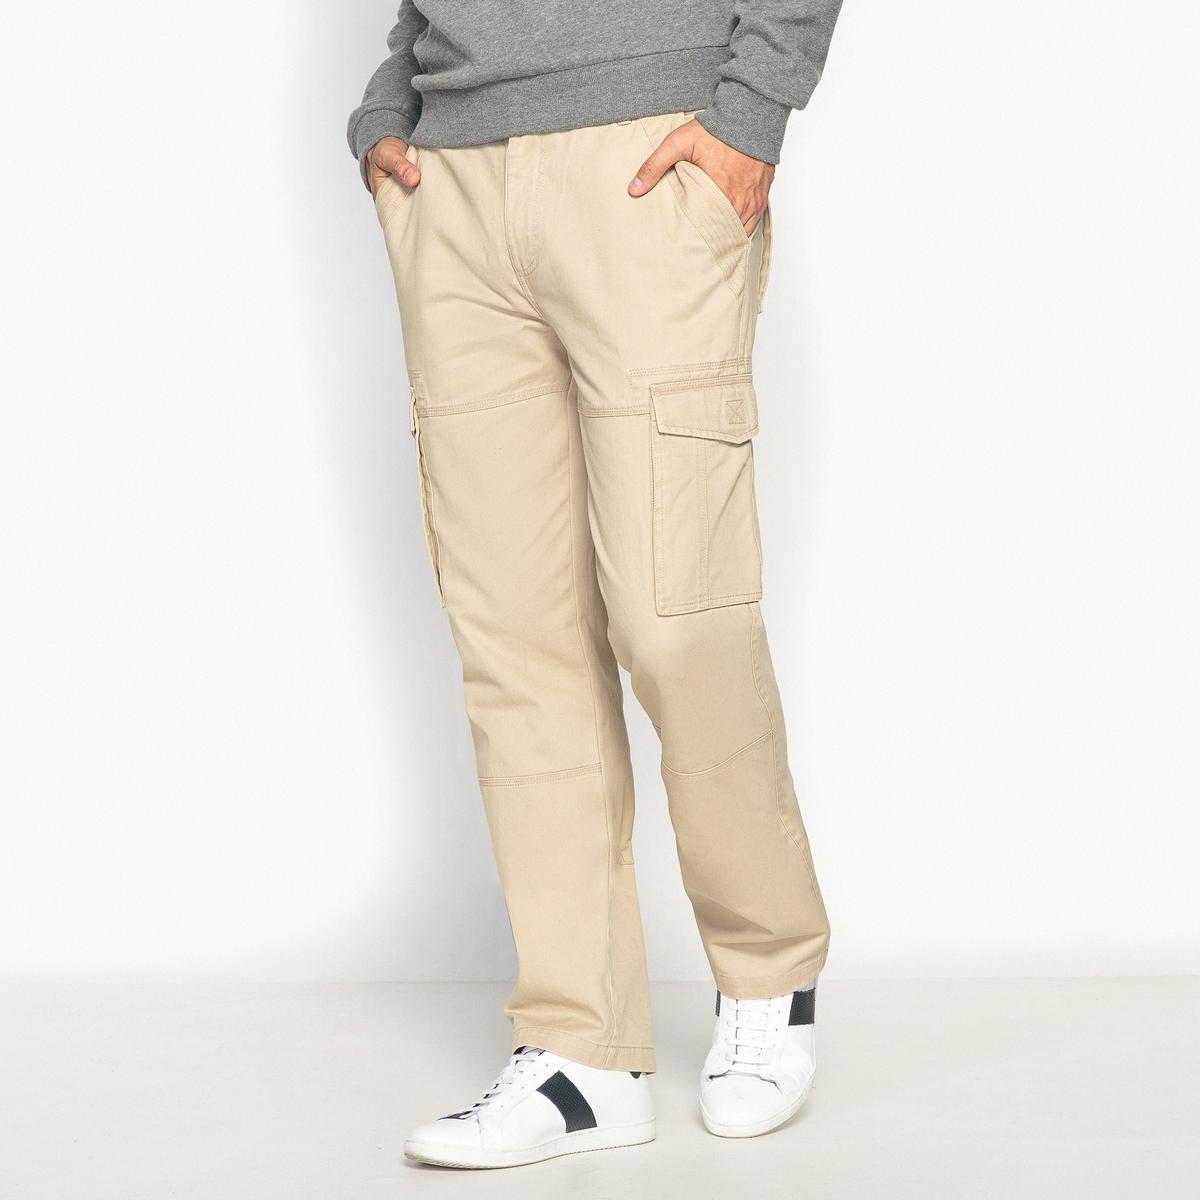 Pantaloni cargo regular puro cotone